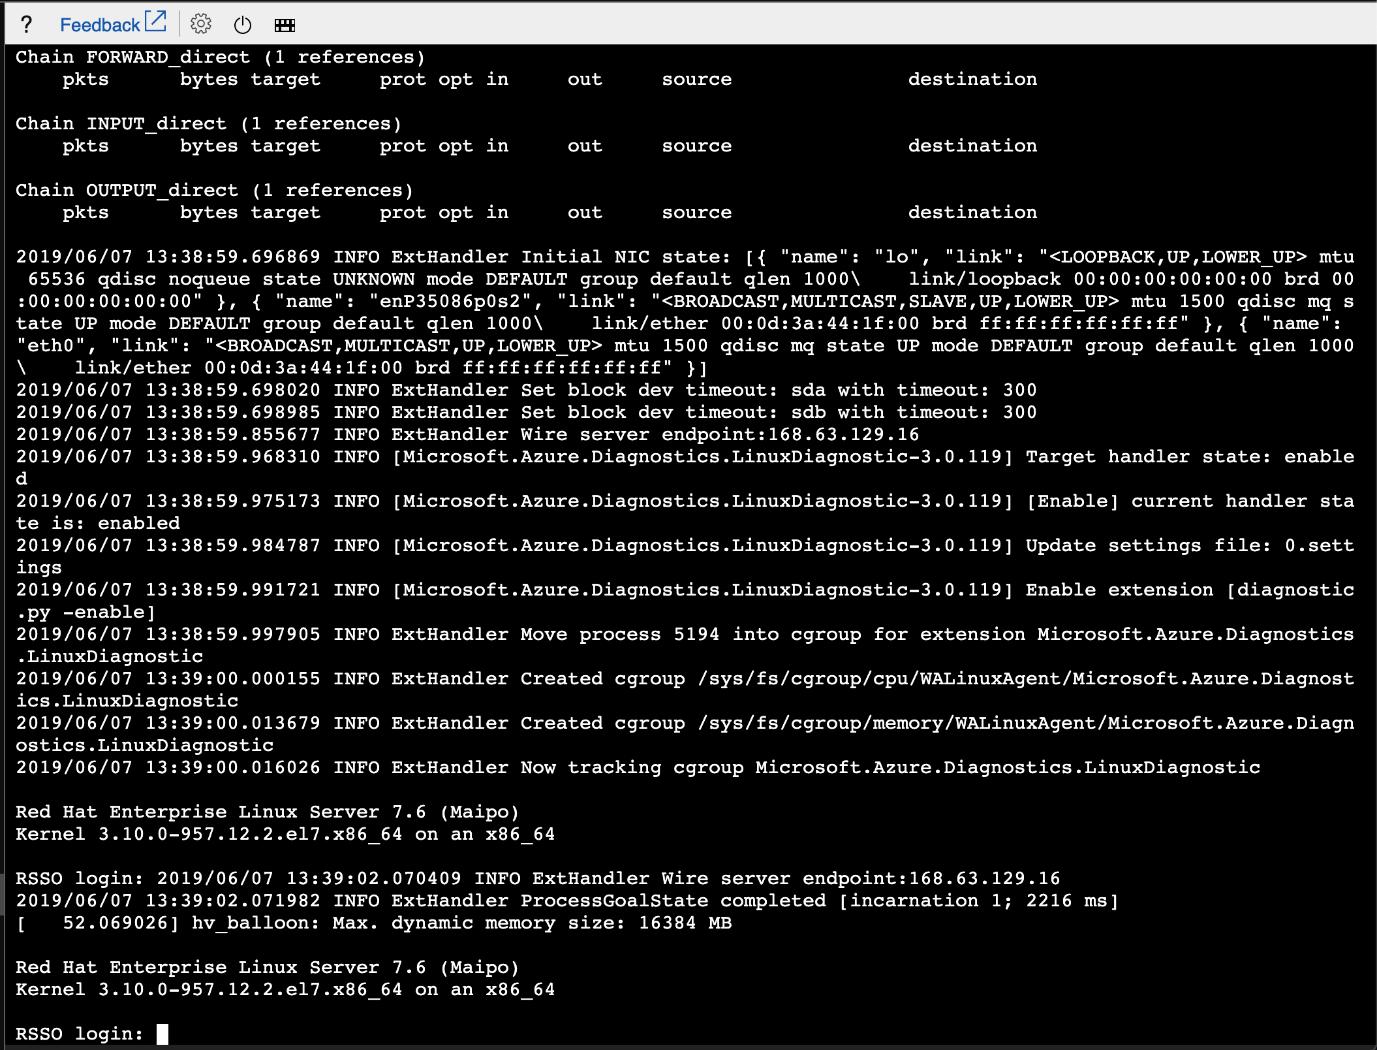 SELinux feedback